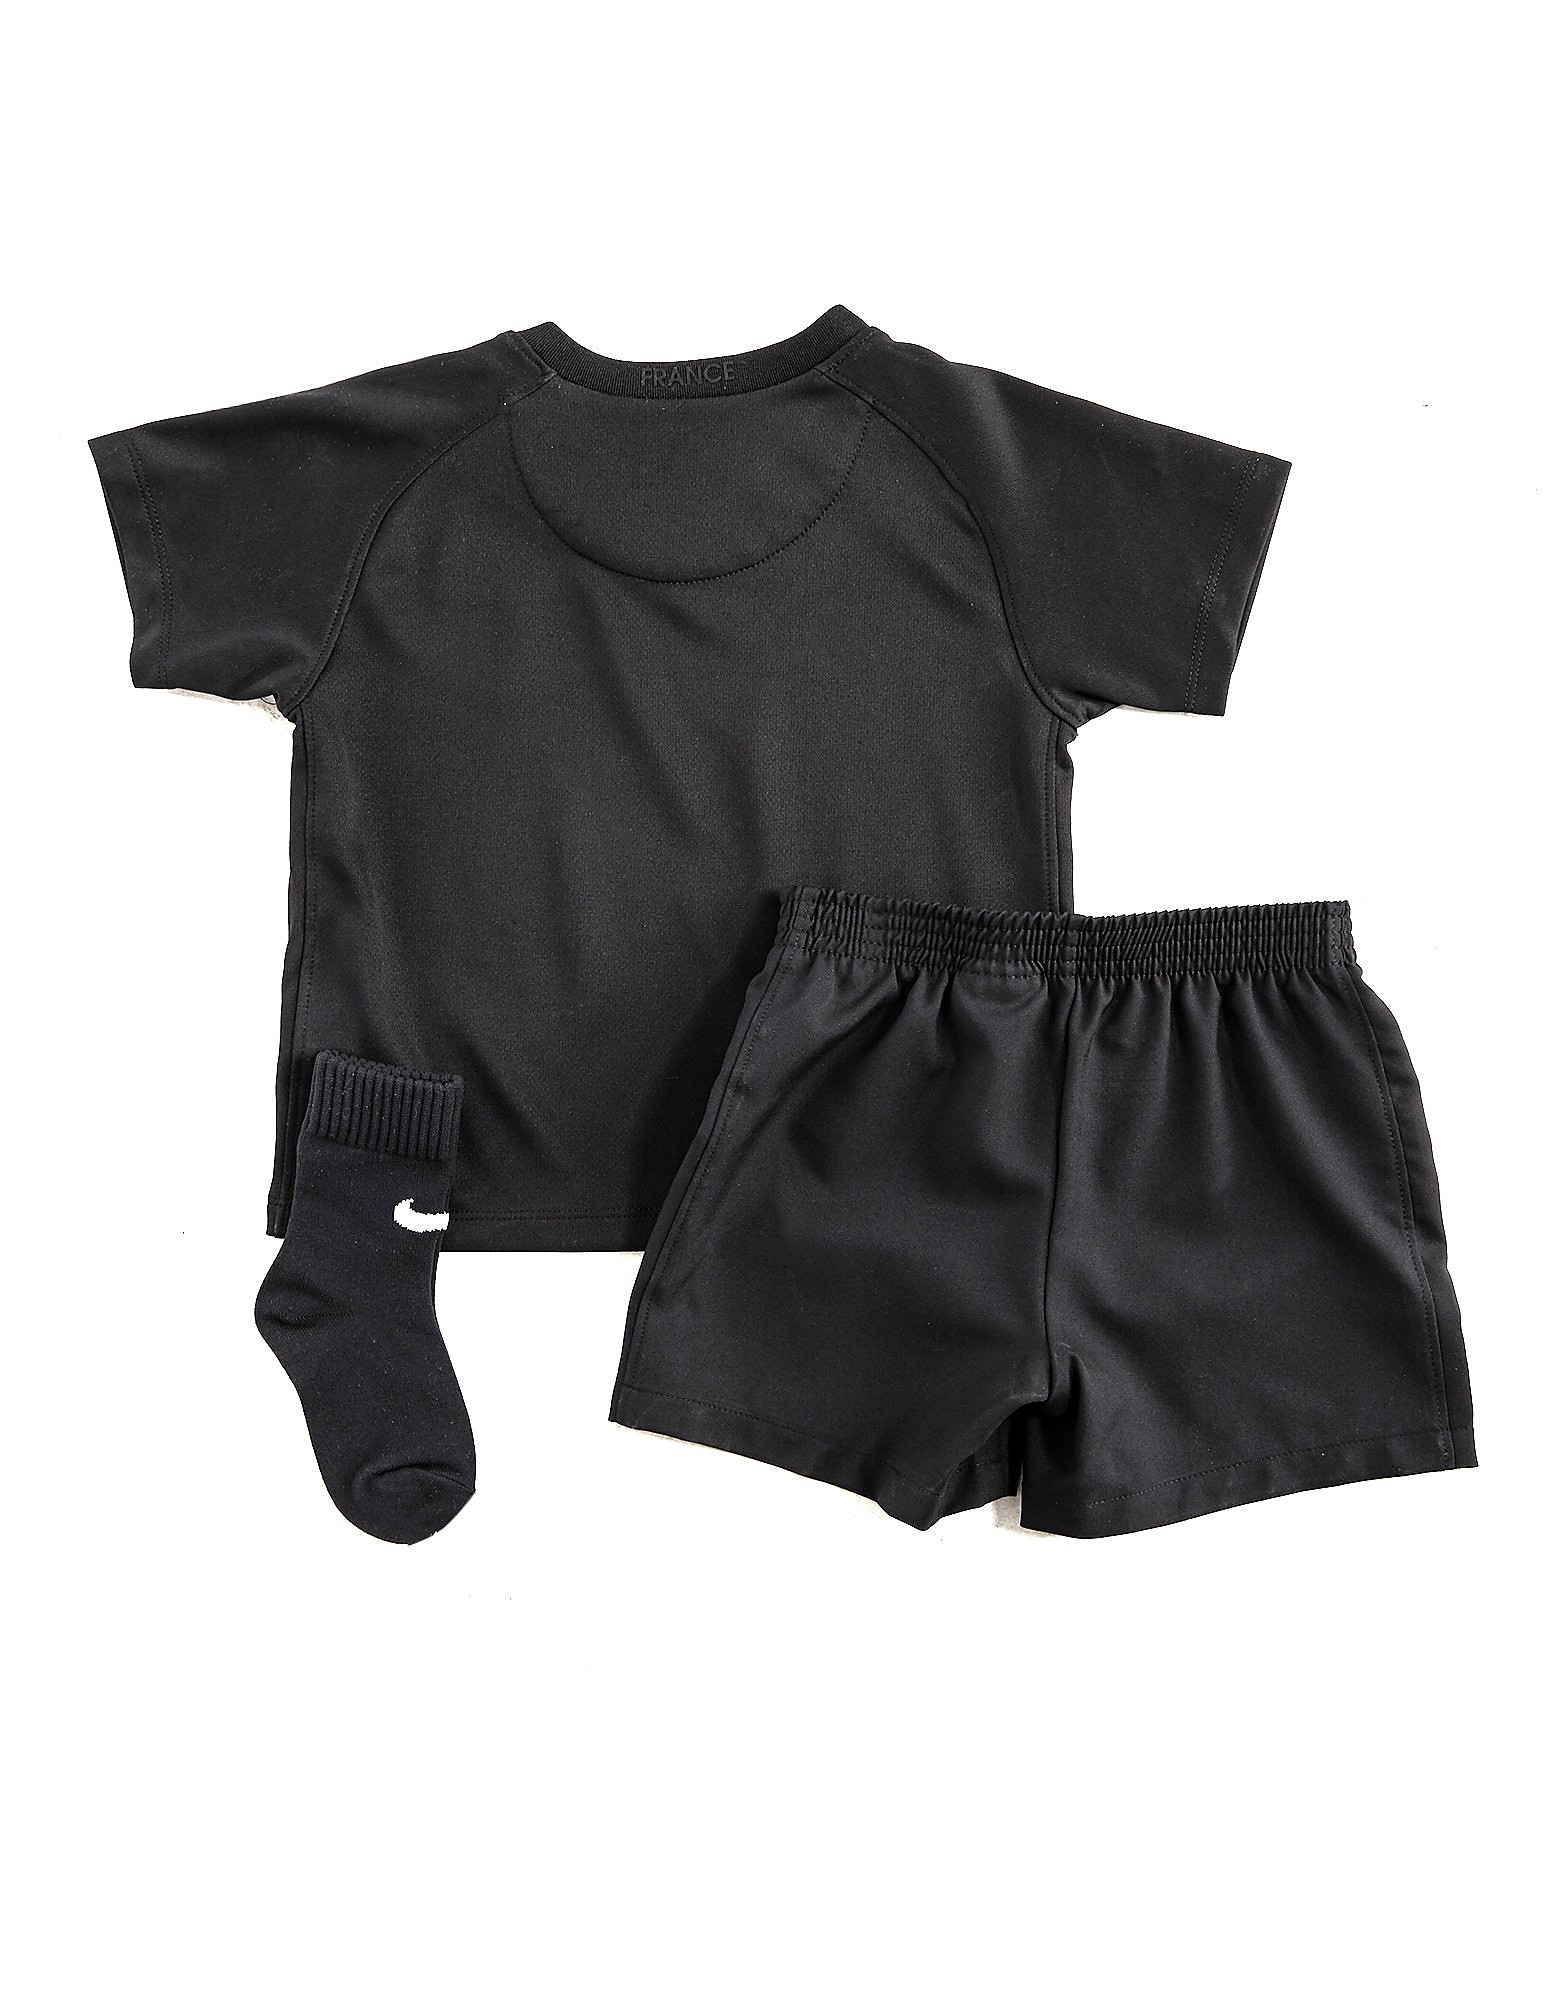 Nike FFF Stadium Infant's Shirt